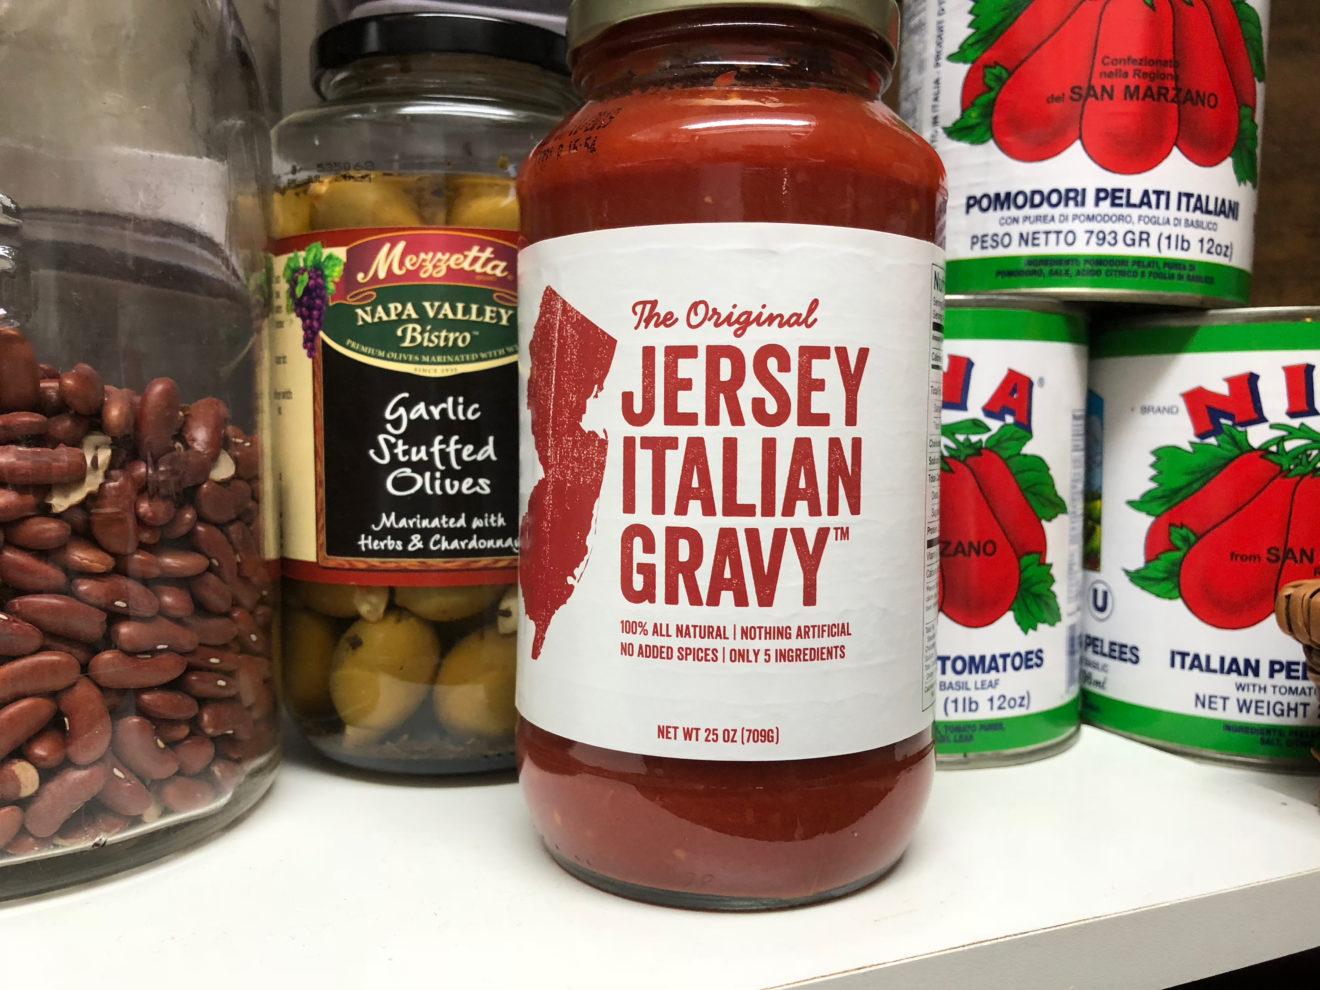 Good gravy!